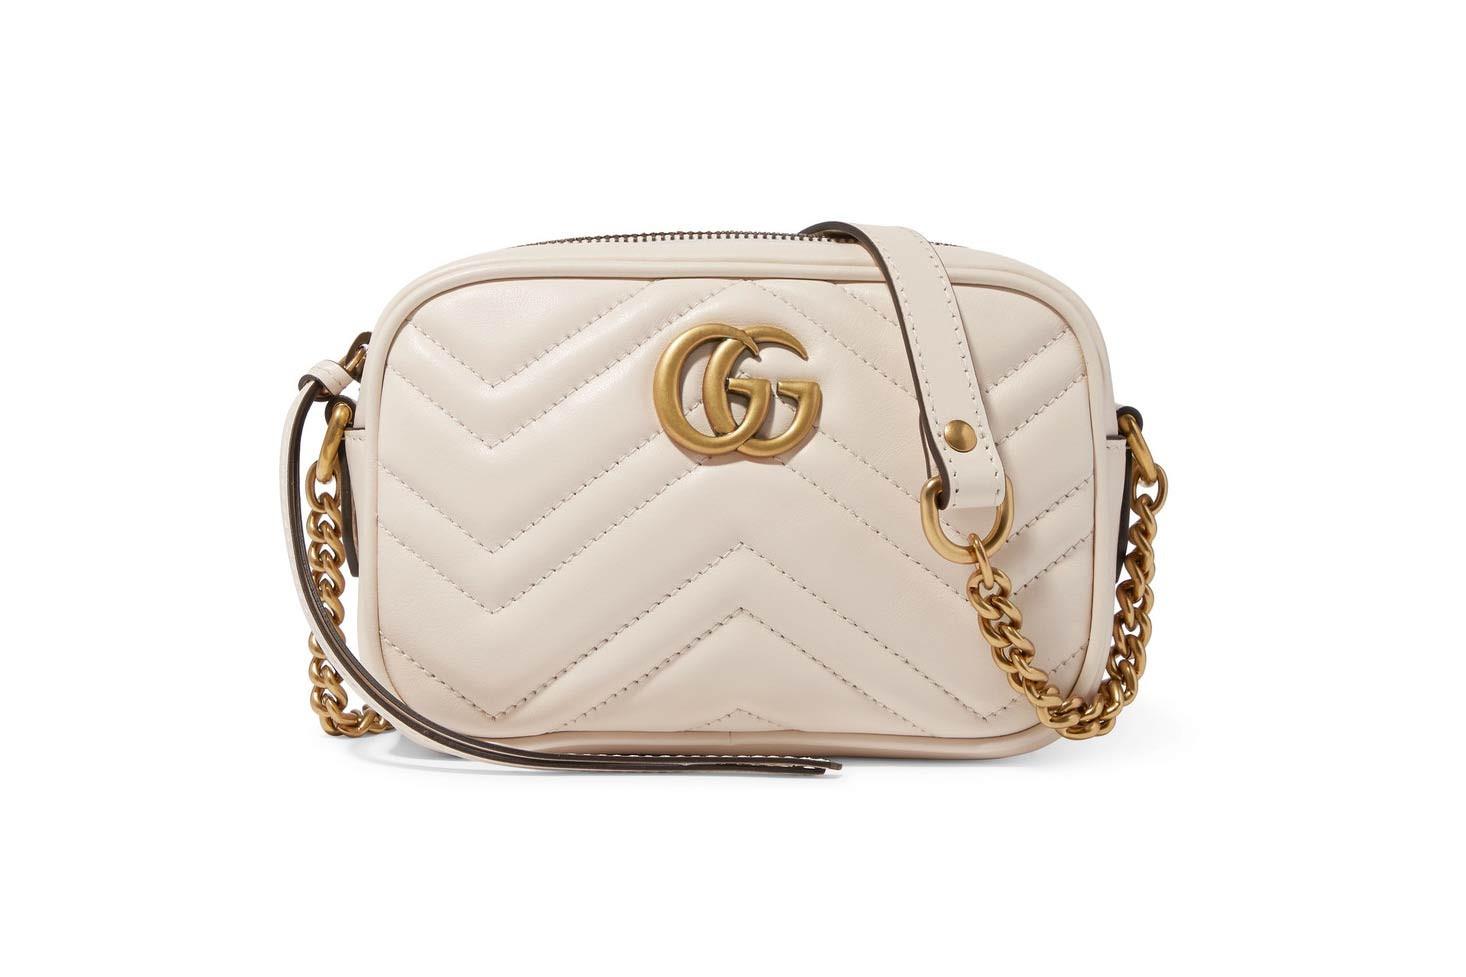 Gucci Gg Marmont Camera Bag Jinna Loves